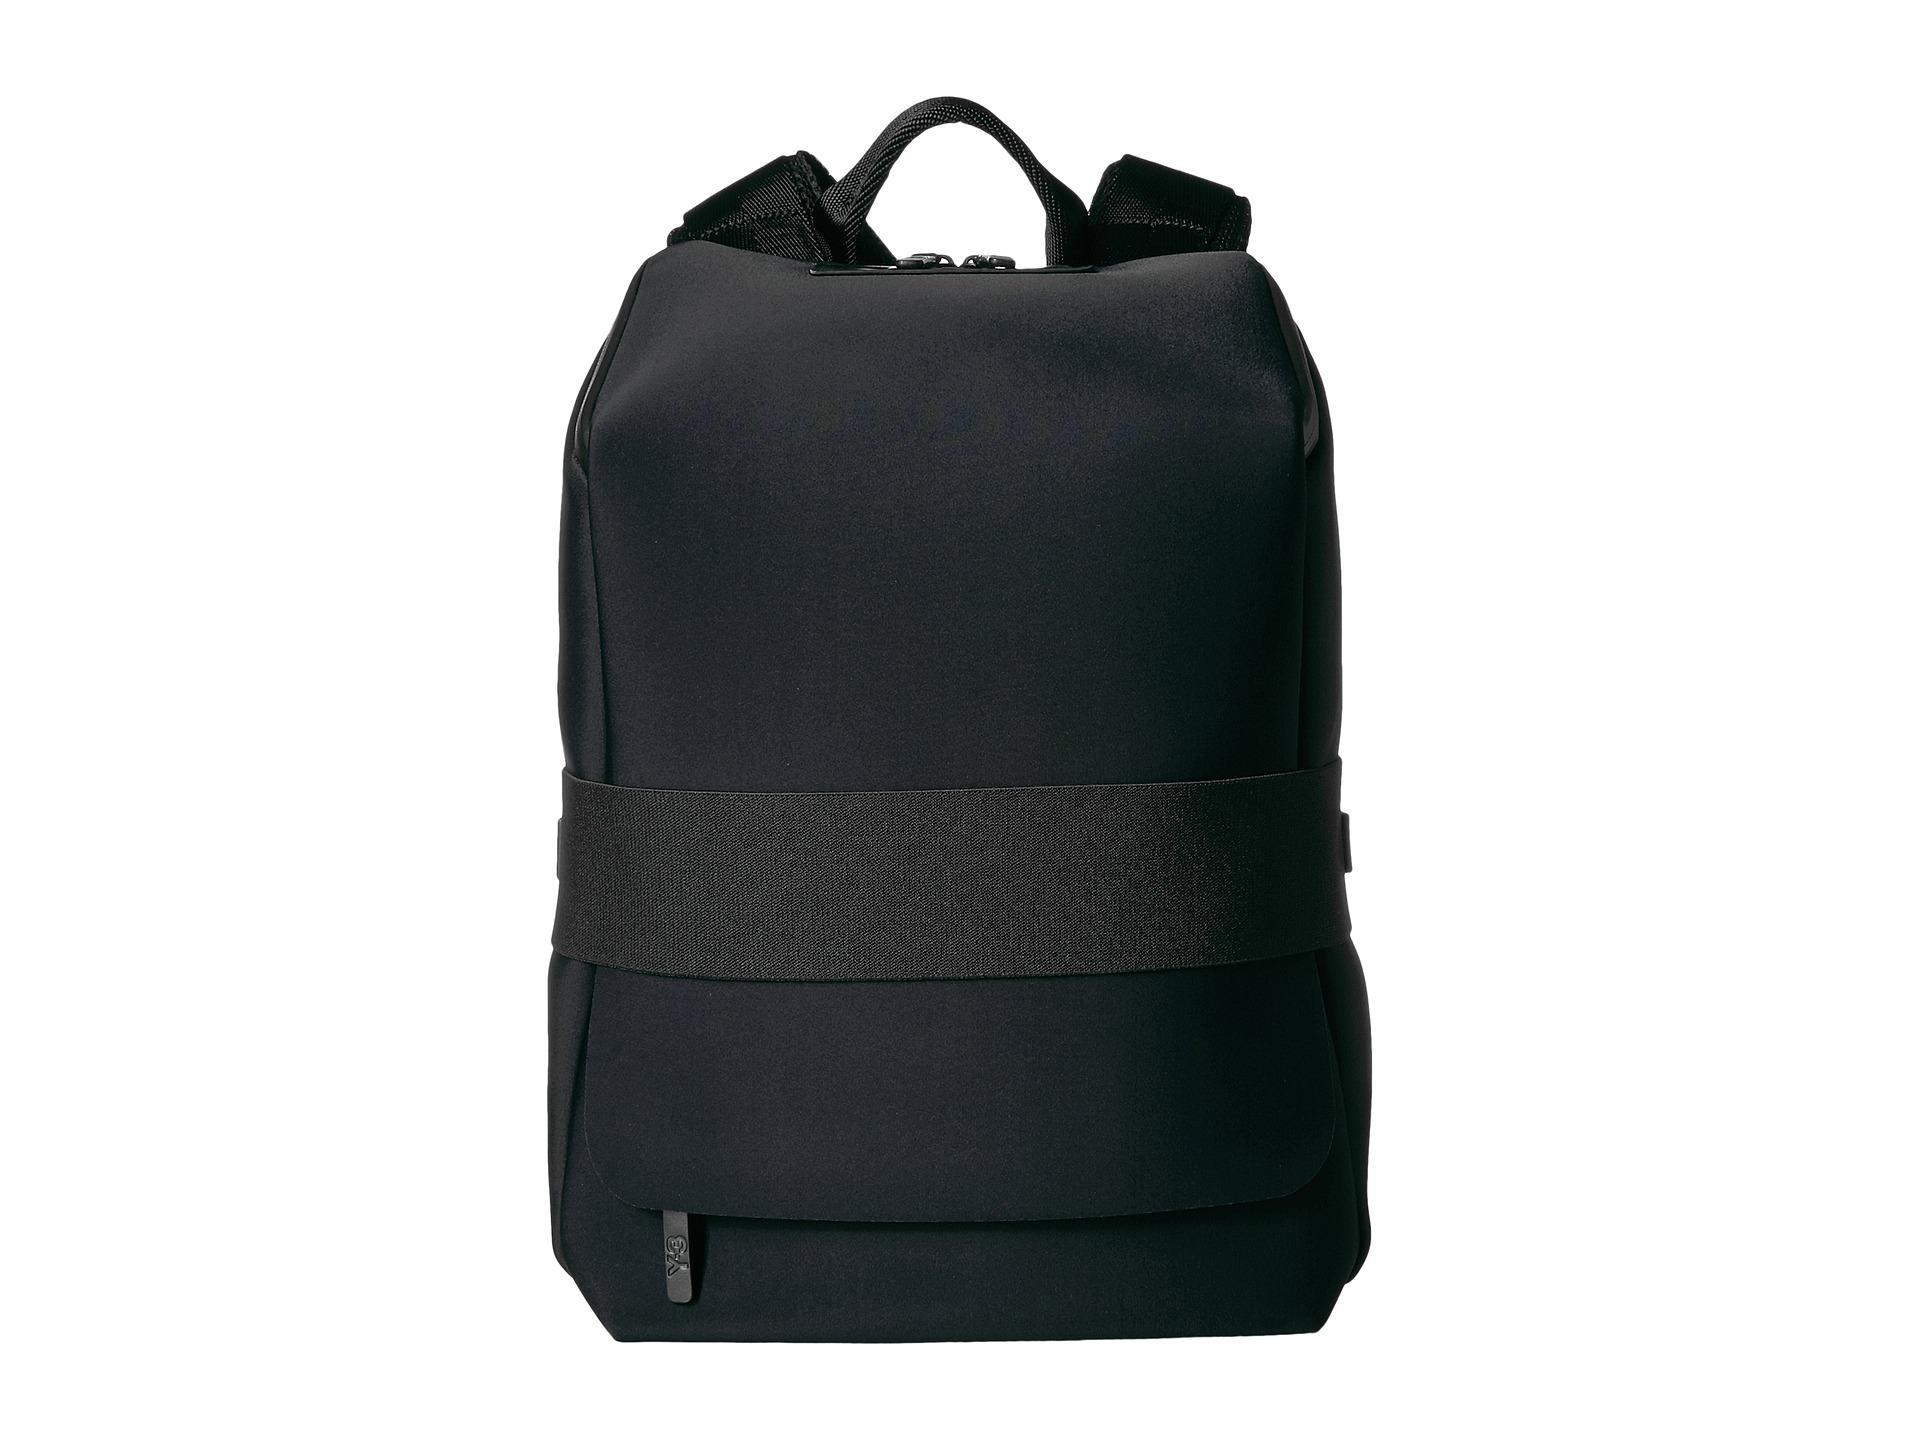 Lyst - Y-3 Qasa Backpack Small in Black for Men 238689c581b0f